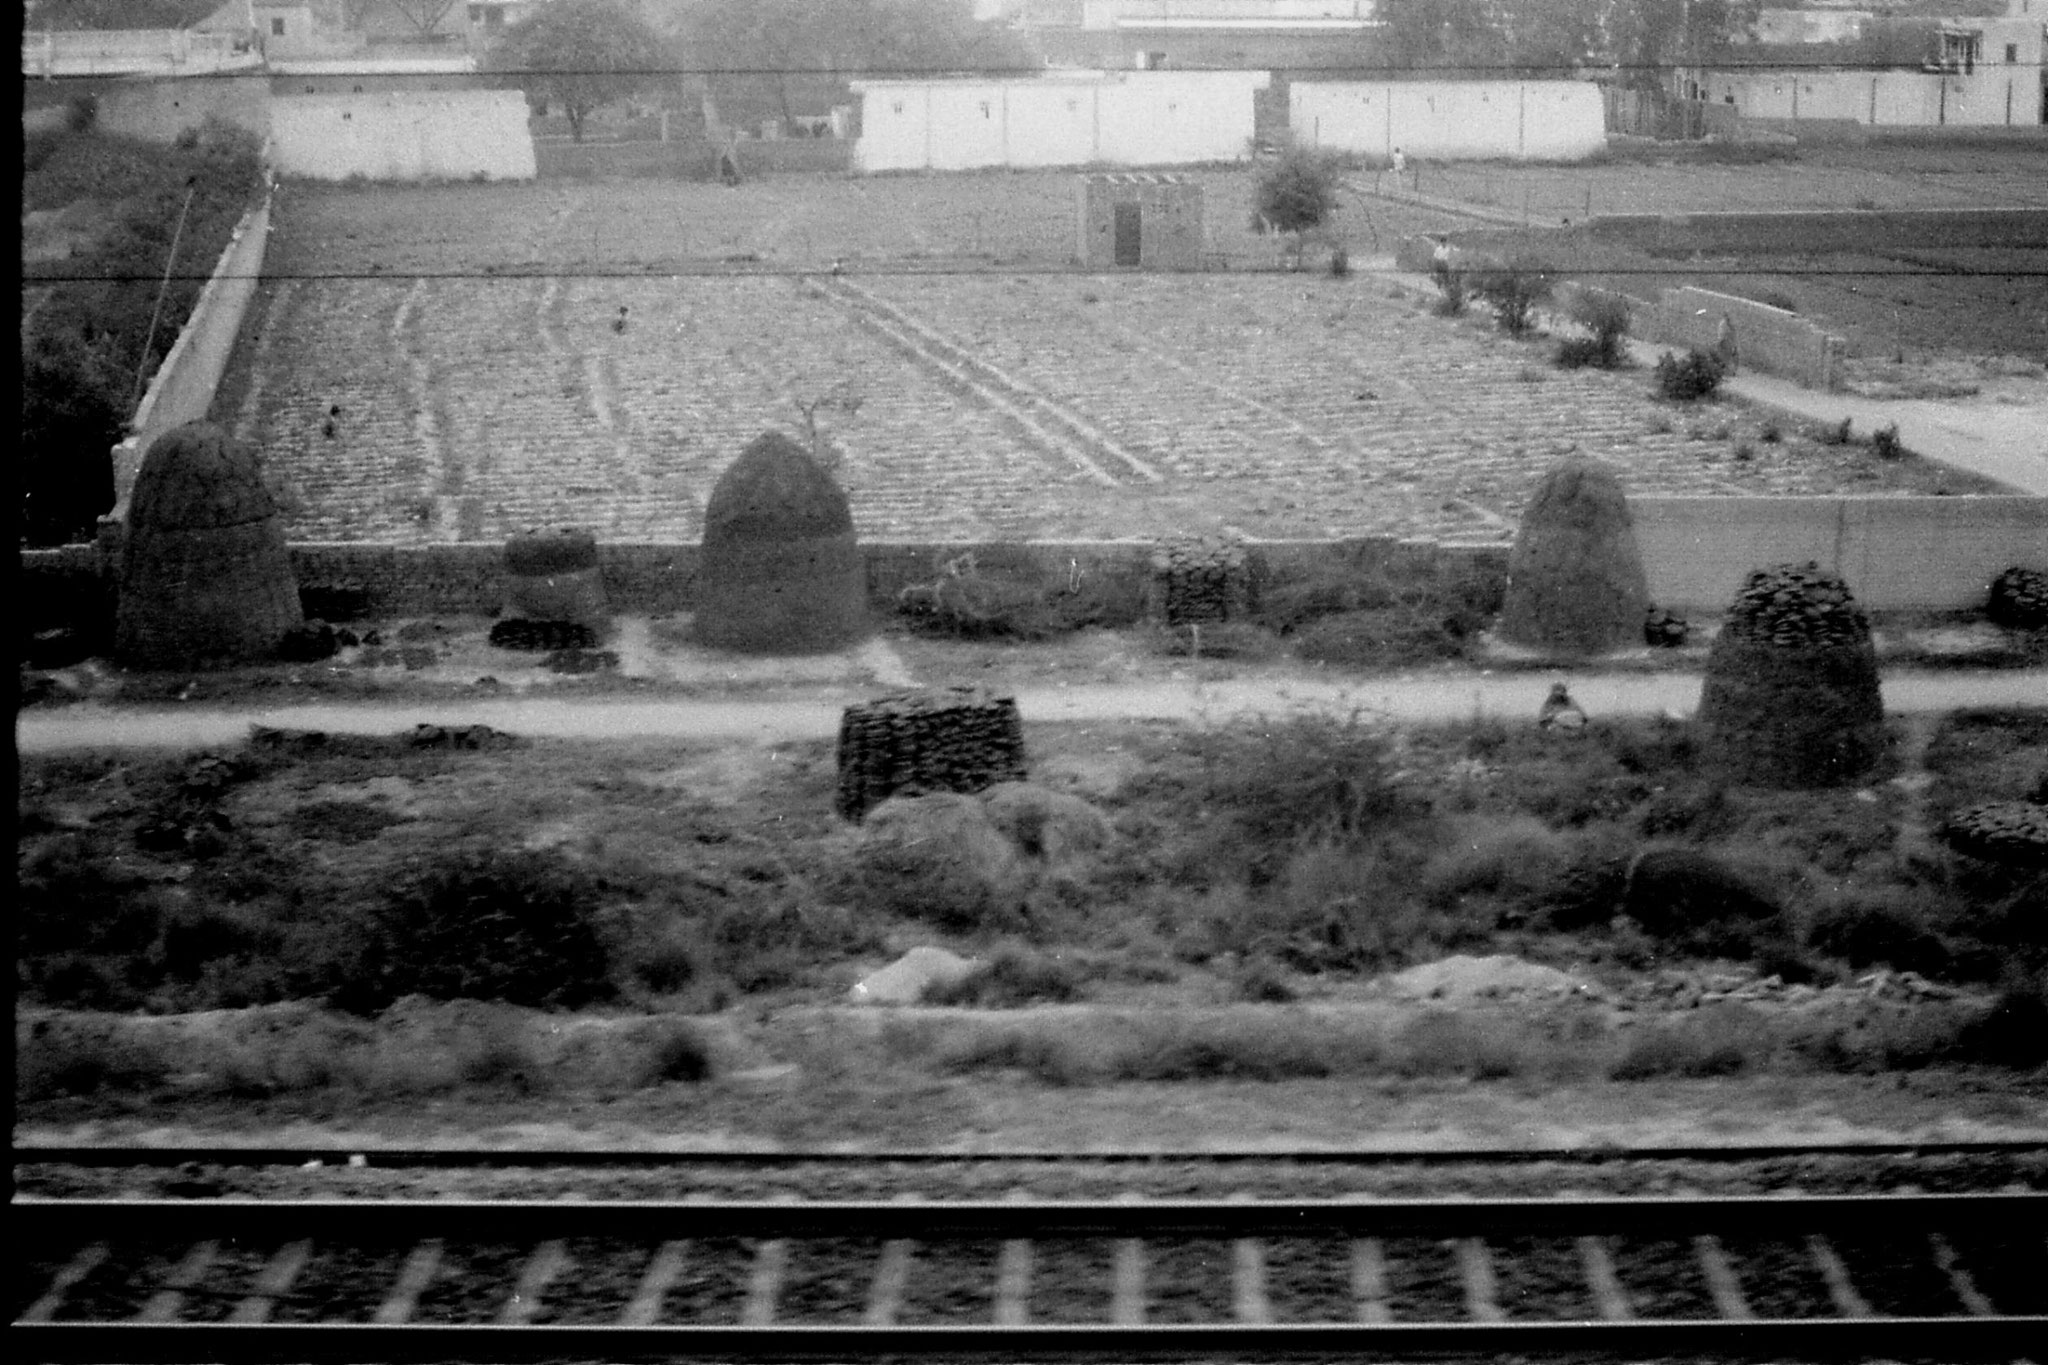 6/4/1990: 35: leaving Delhi